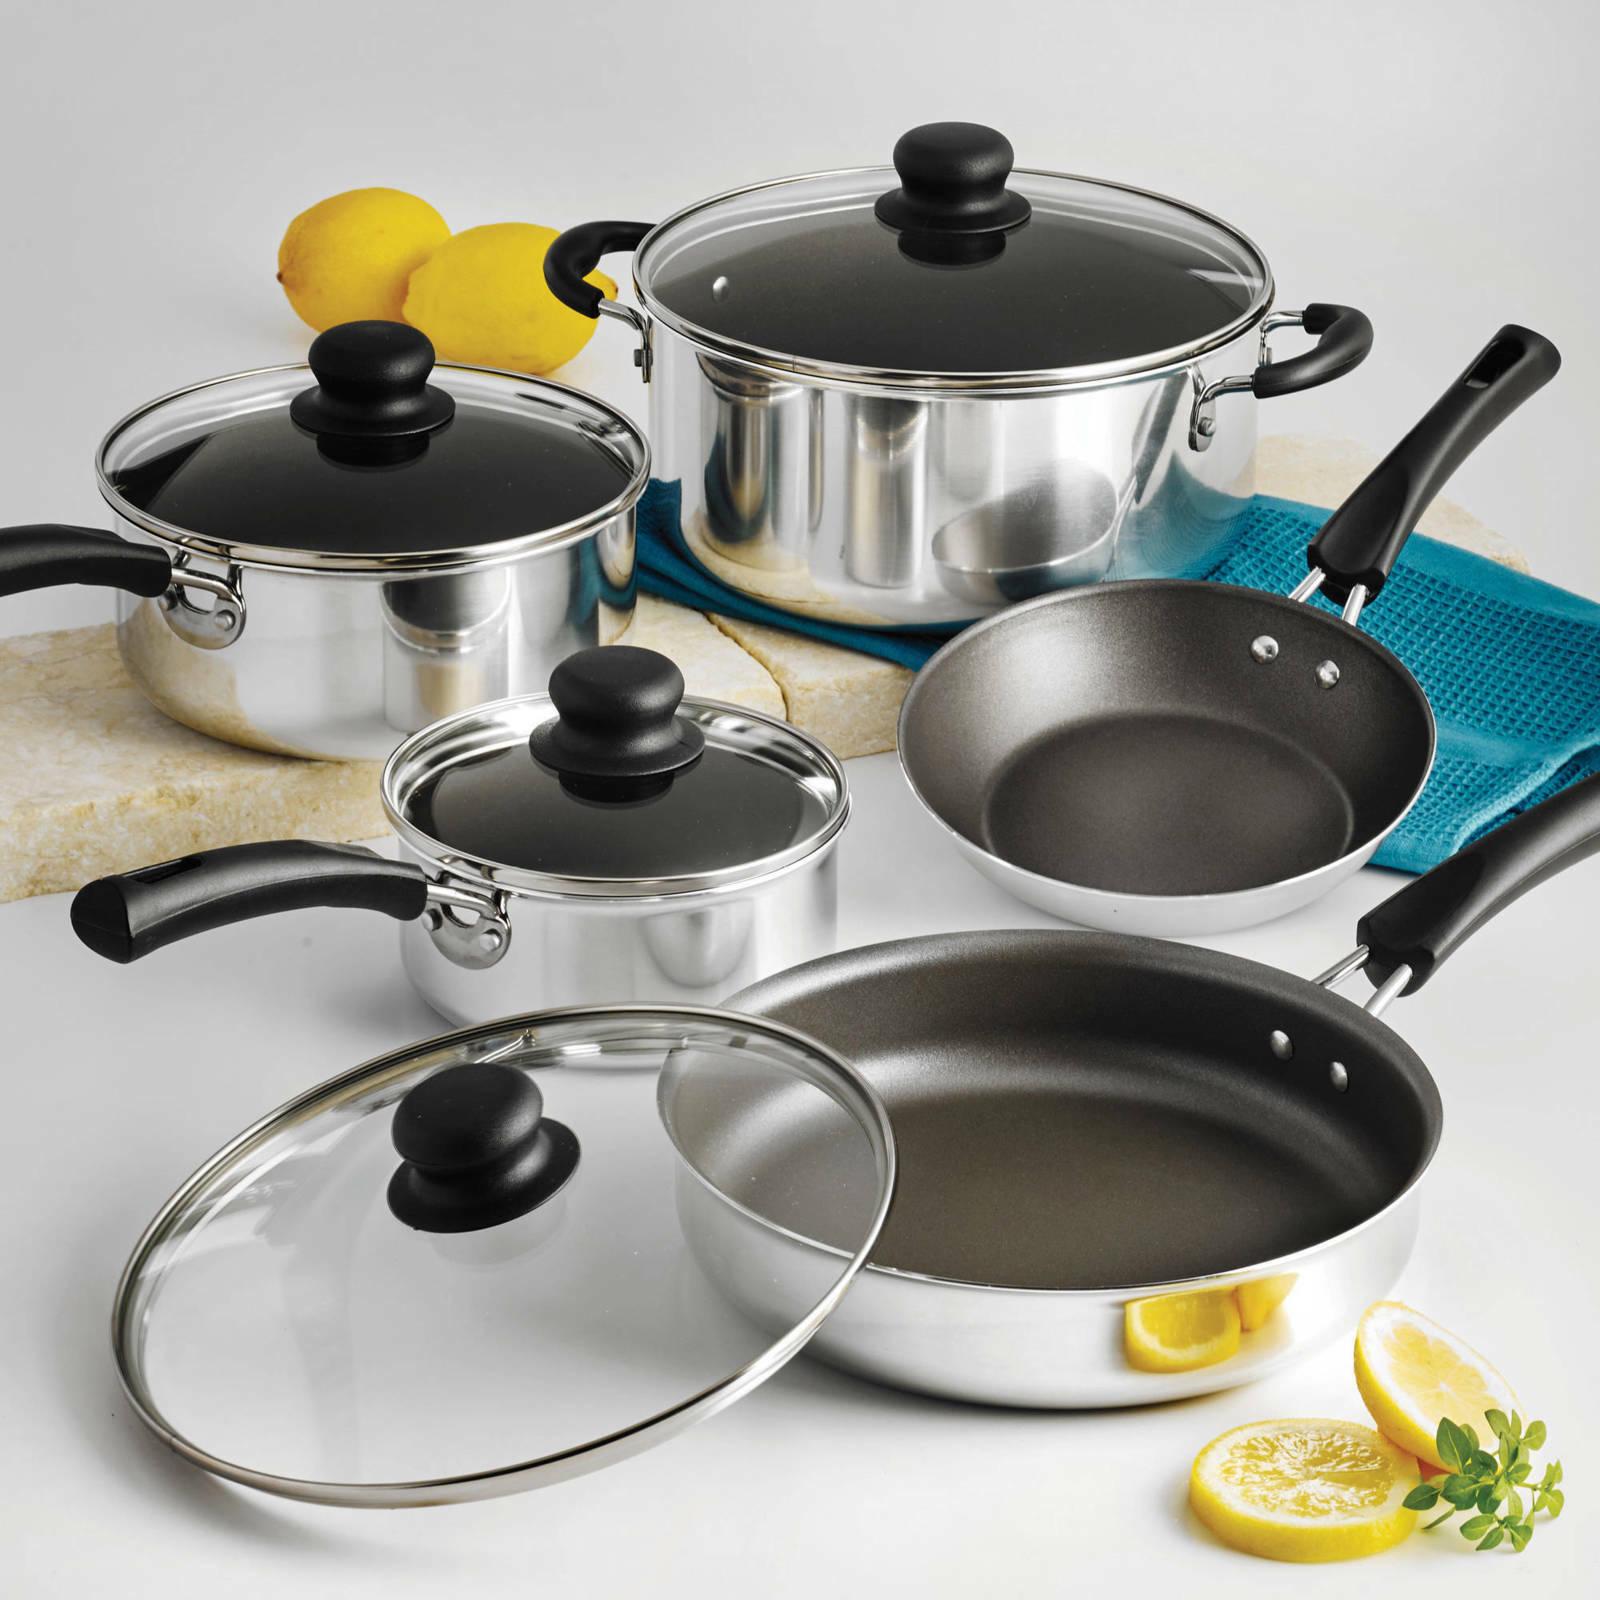 9 Piece Essential Nonstick Cookware Set Pots And Pans Kitche